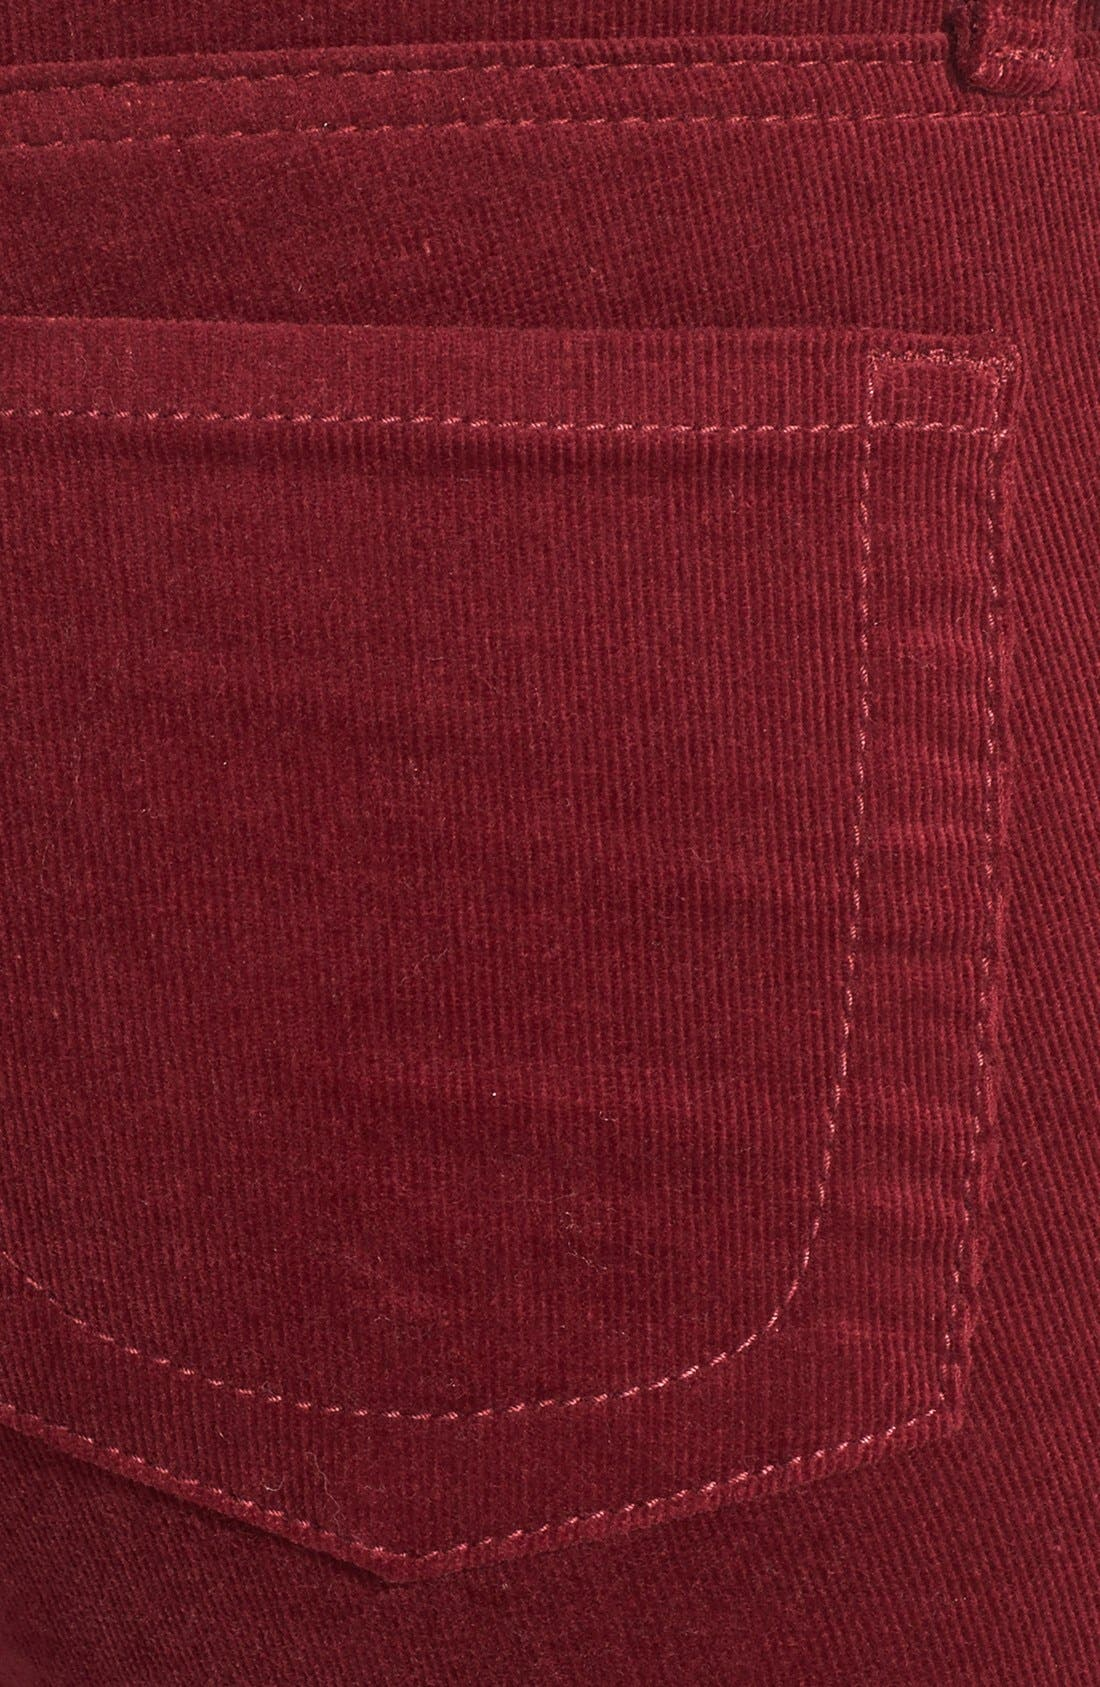 'Diana' Stretch Corduroy Skinny Pants,                             Alternate thumbnail 147, color,